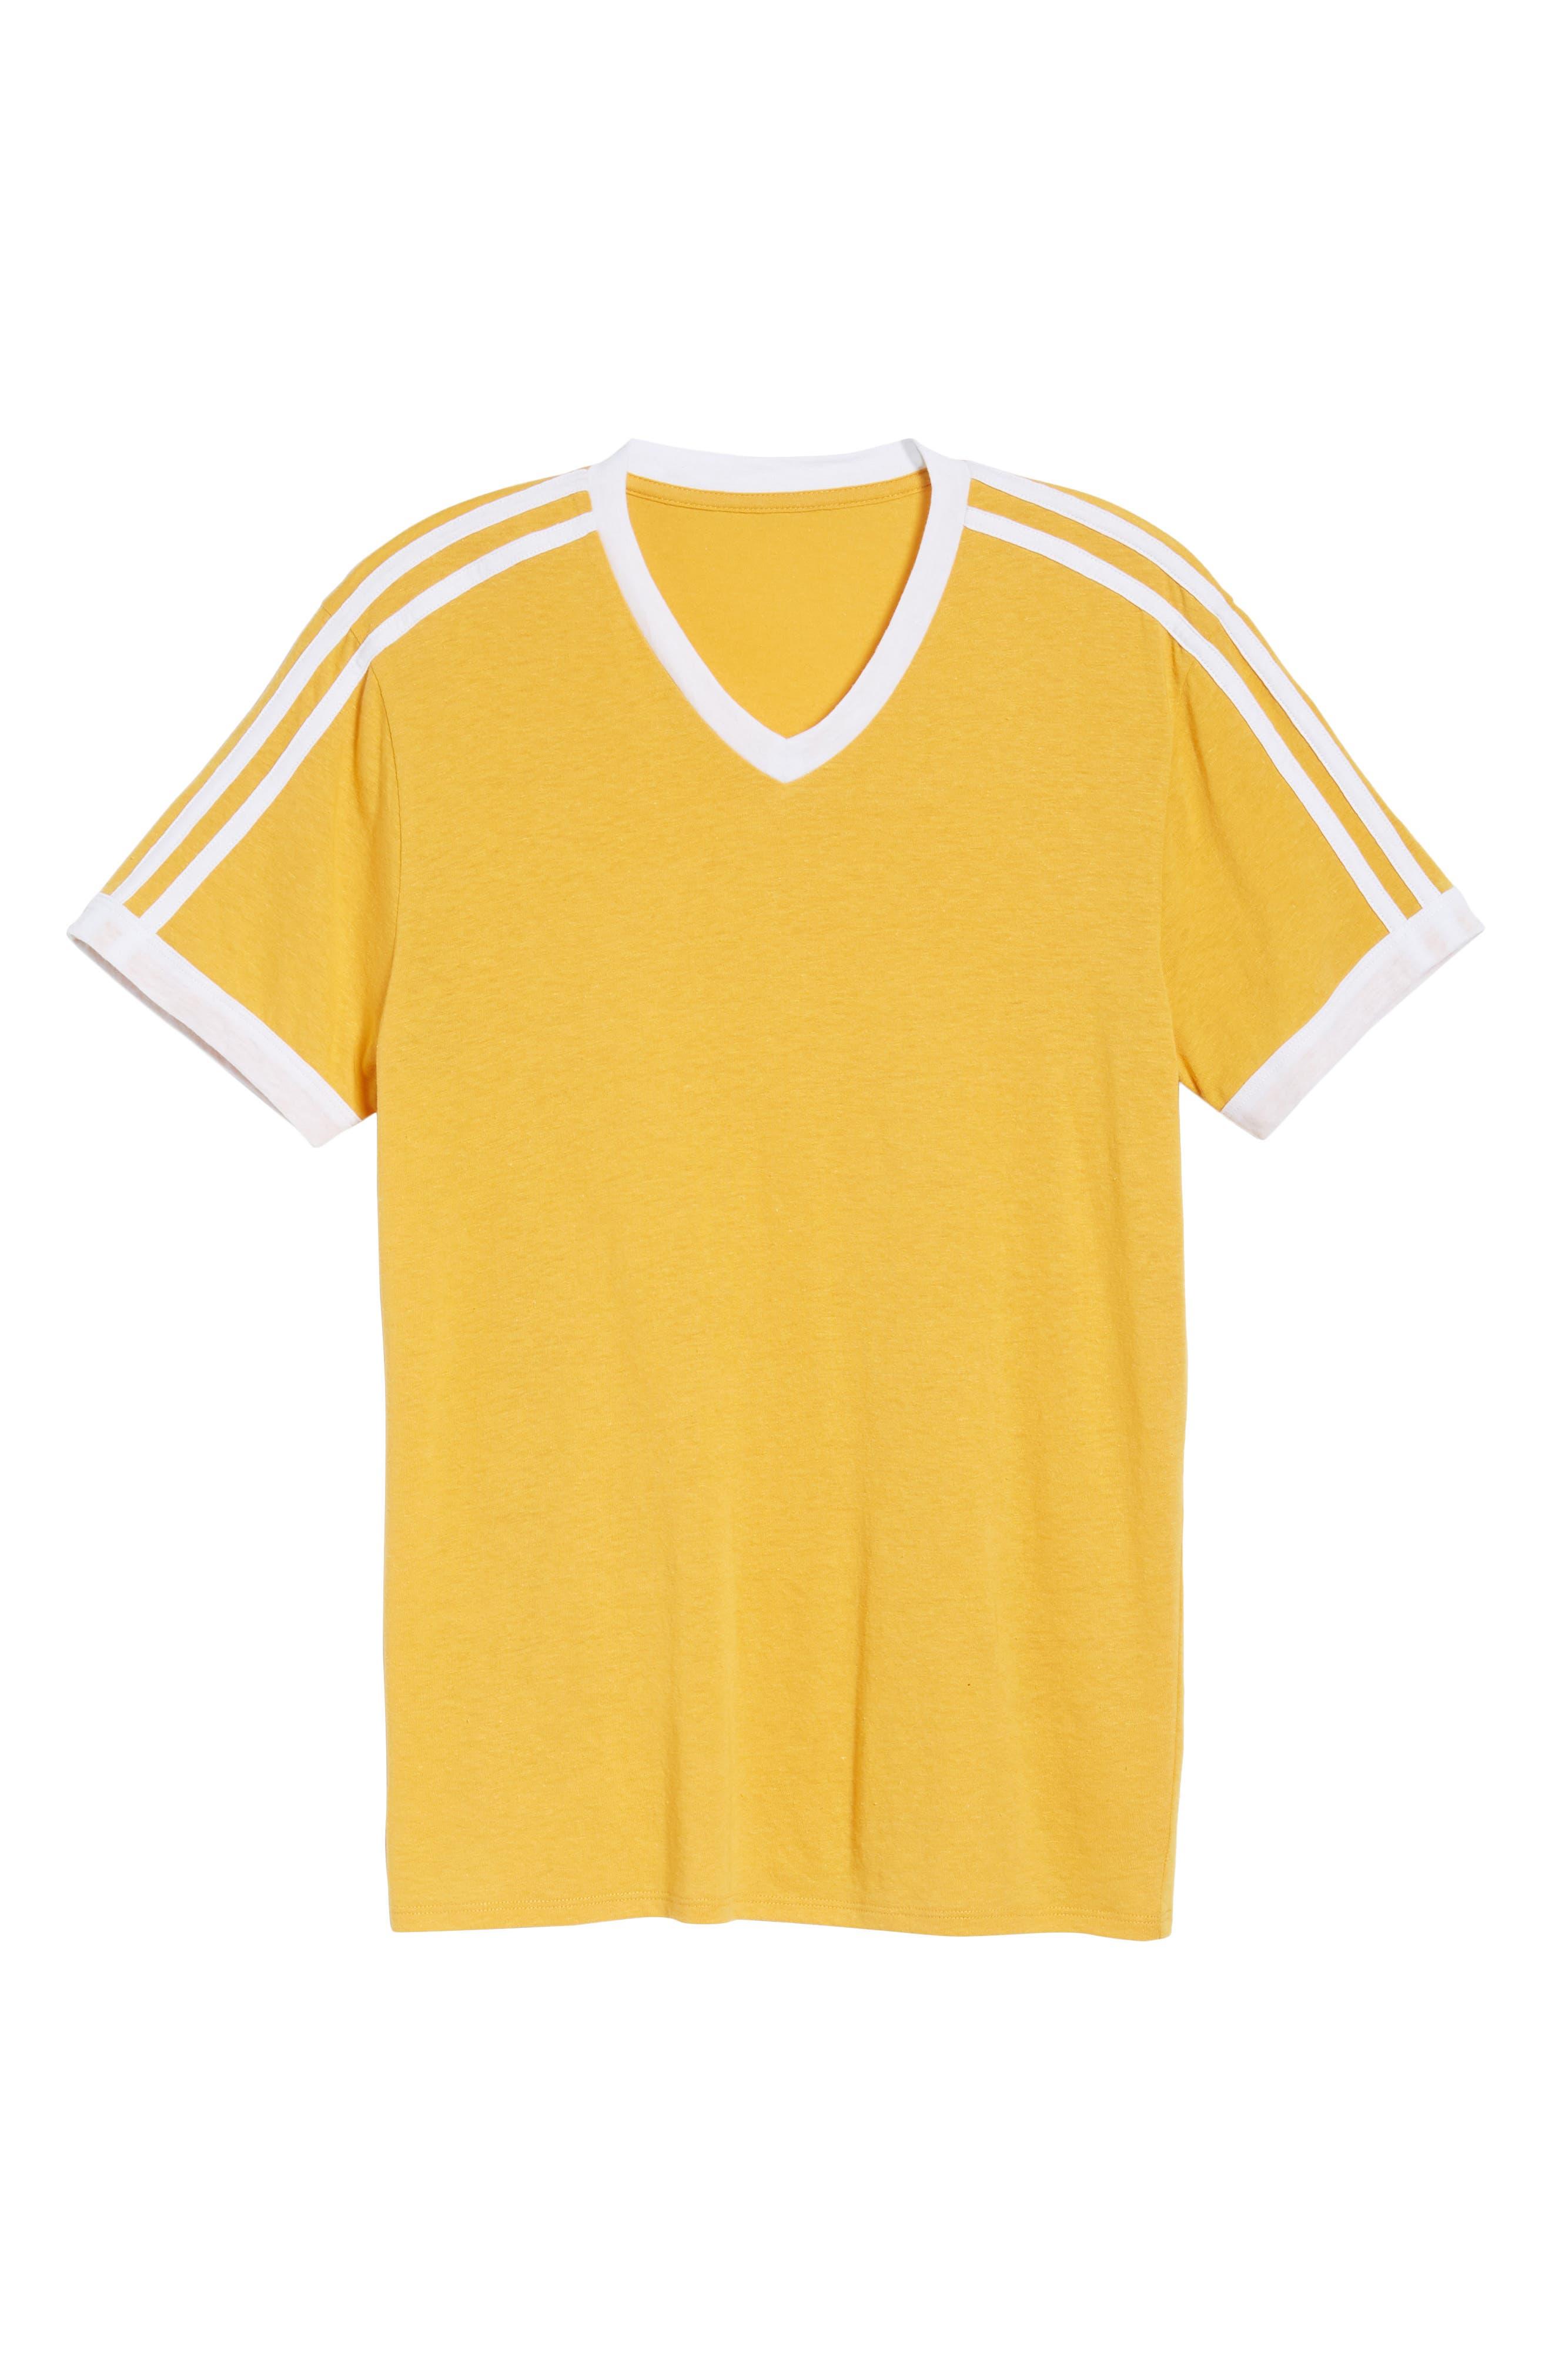 Vintage Athletic V-Neck T-Shirt,                             Alternate thumbnail 6, color,                             Yellow Mineral / White Stripe